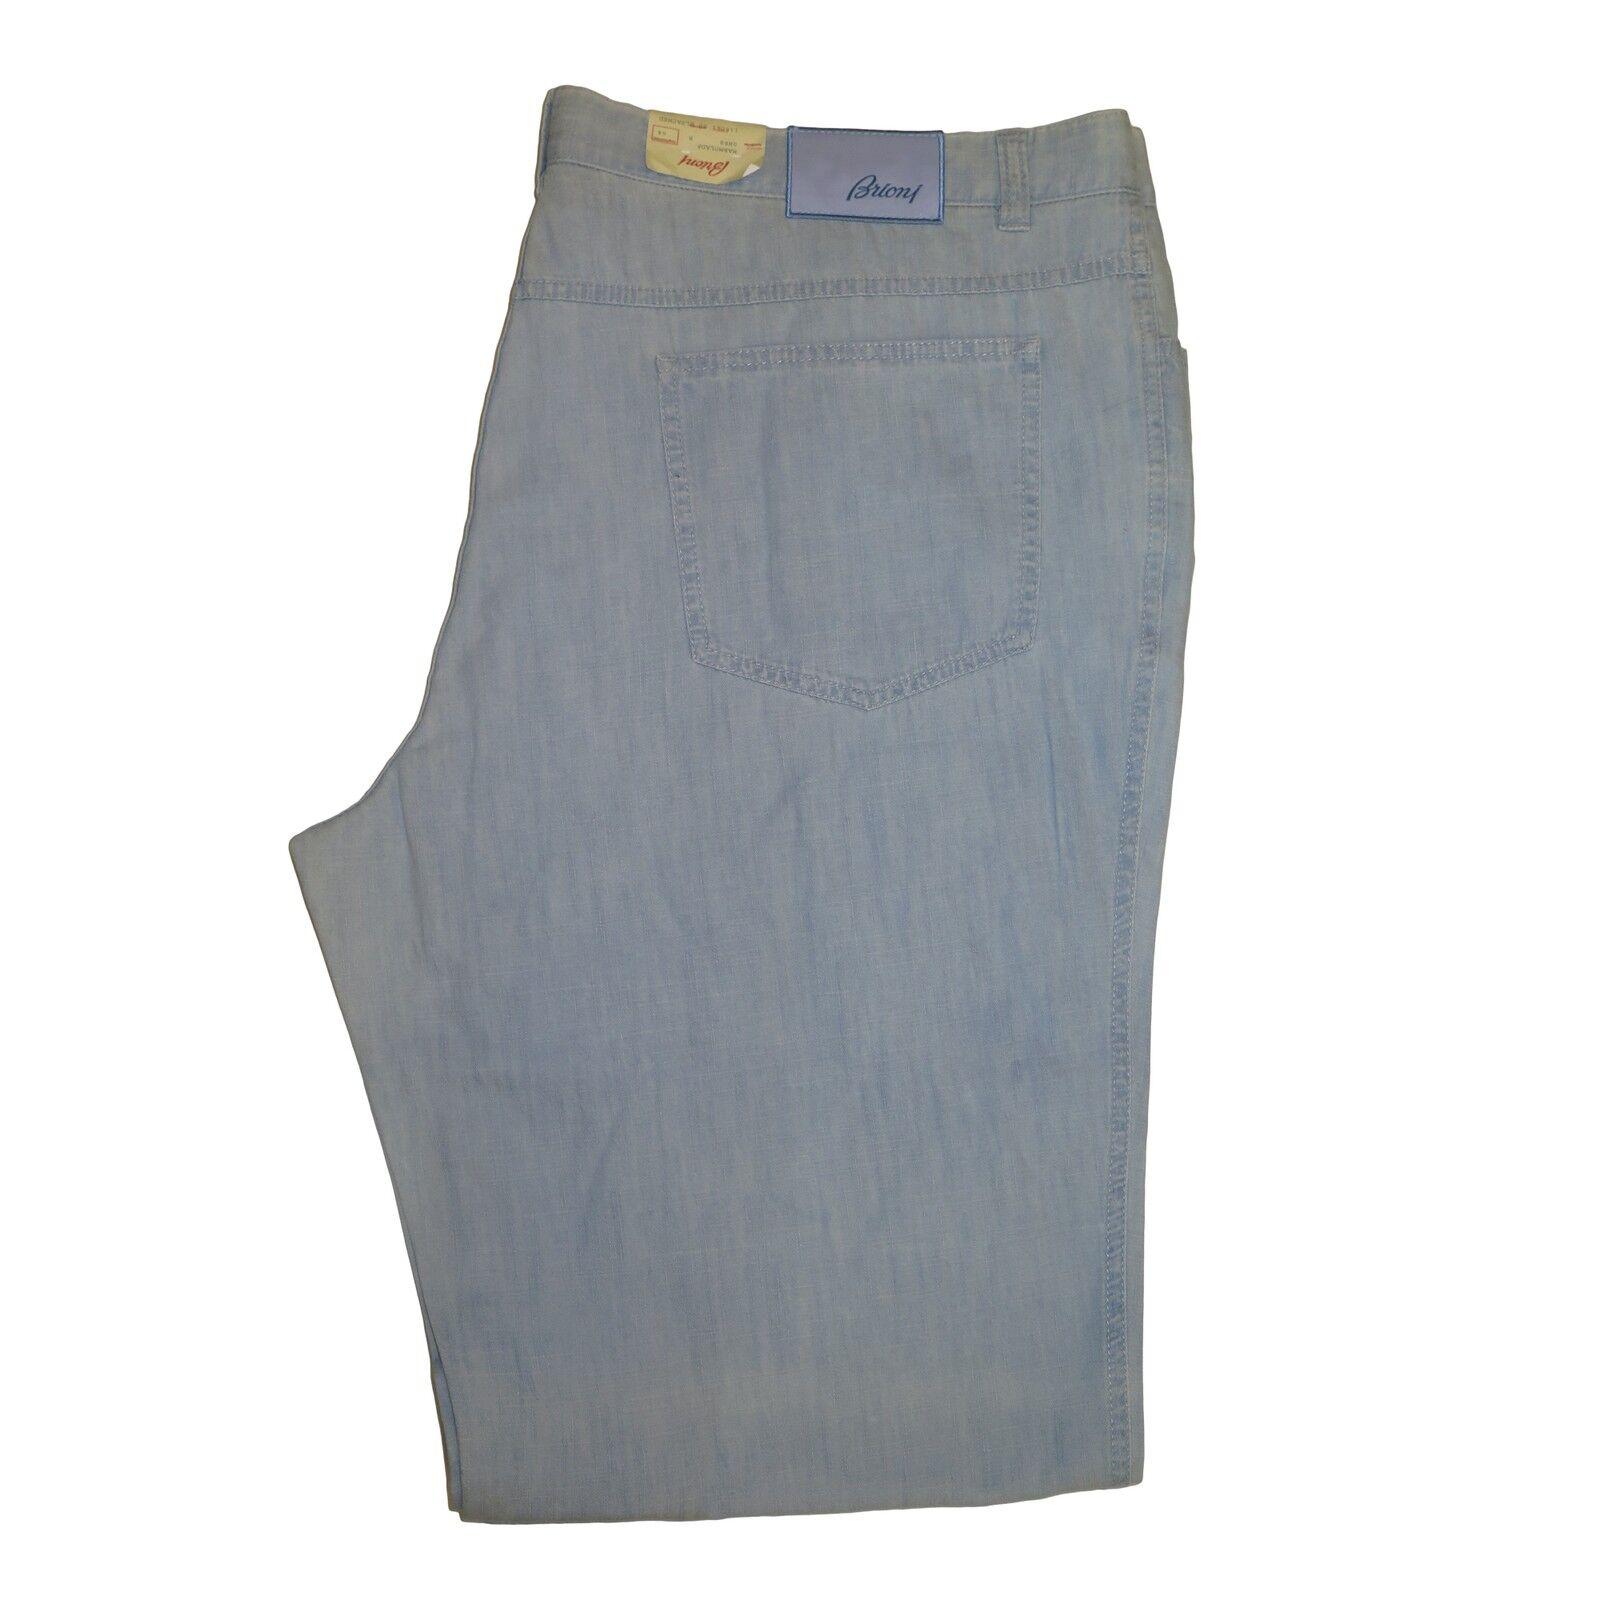 Brioni Men's Marmolada Light bluee 100% Cotton Lightweight Denim Jeans Pants 30